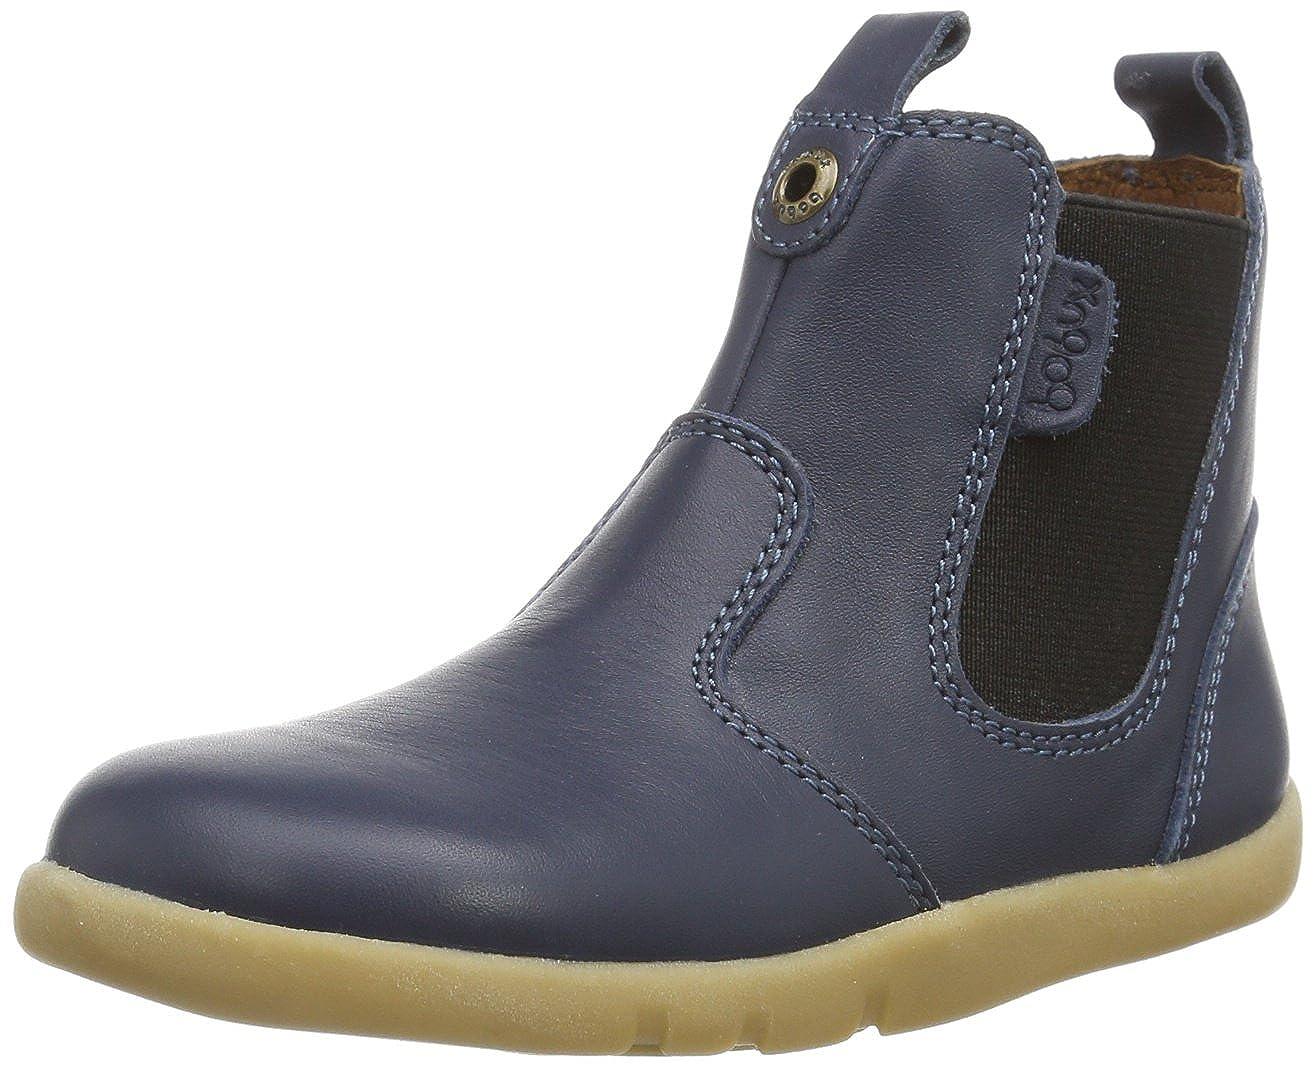 Bobux 460639Unisex Children's Chelsea Boots 460639_Chelsa Boots